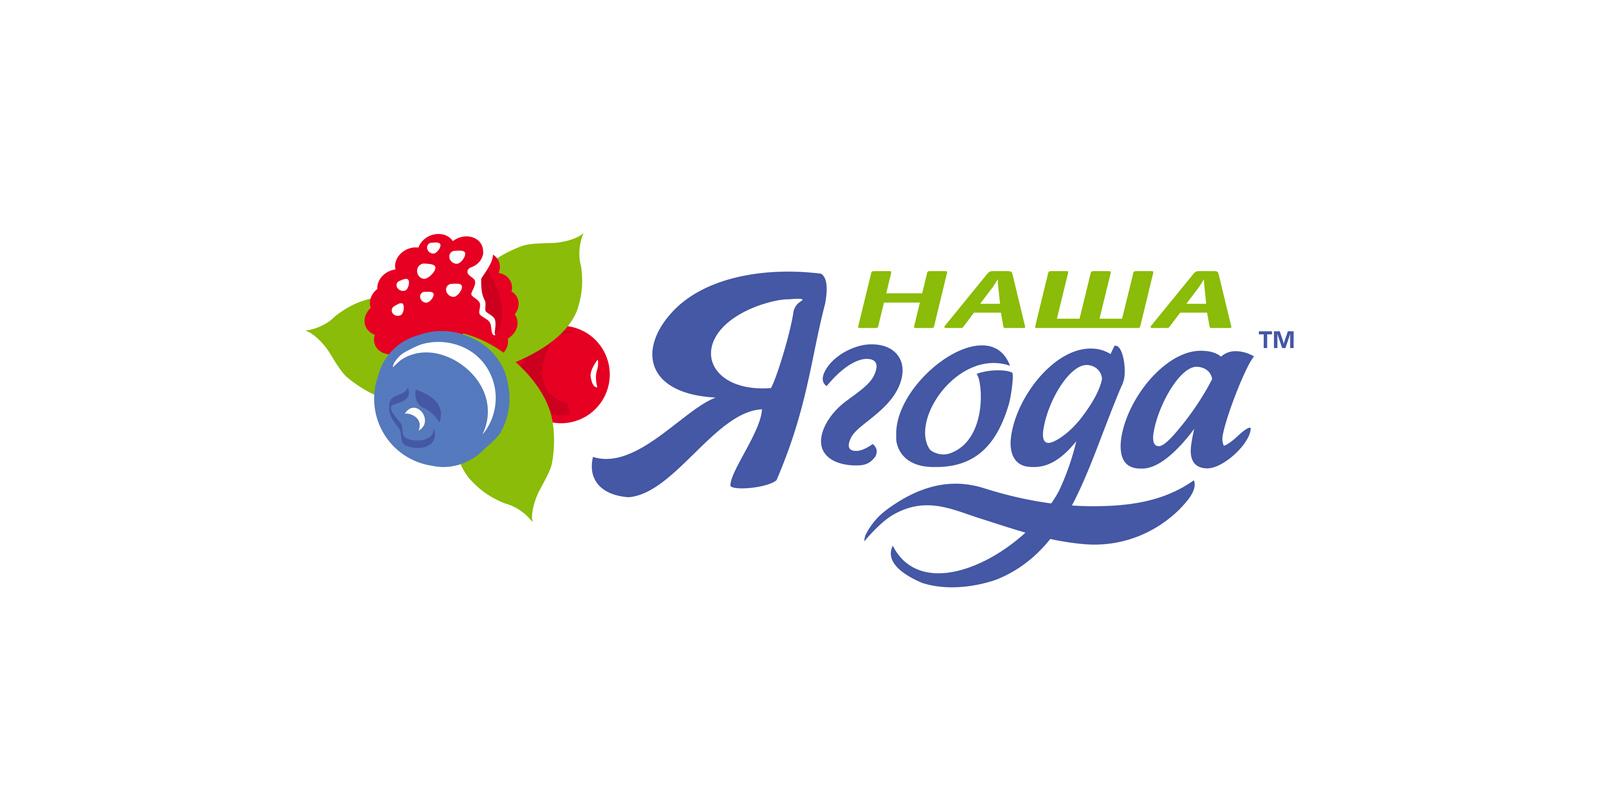 TM «Наша ягода»;;;;;;Разработка концепции логотипа;;;;;;<span>Клиент:</span> TM «Наша ягода»;;;;;;;;;;;;Разработка концепции логотипа;;;;;; 1 ;;;;;;